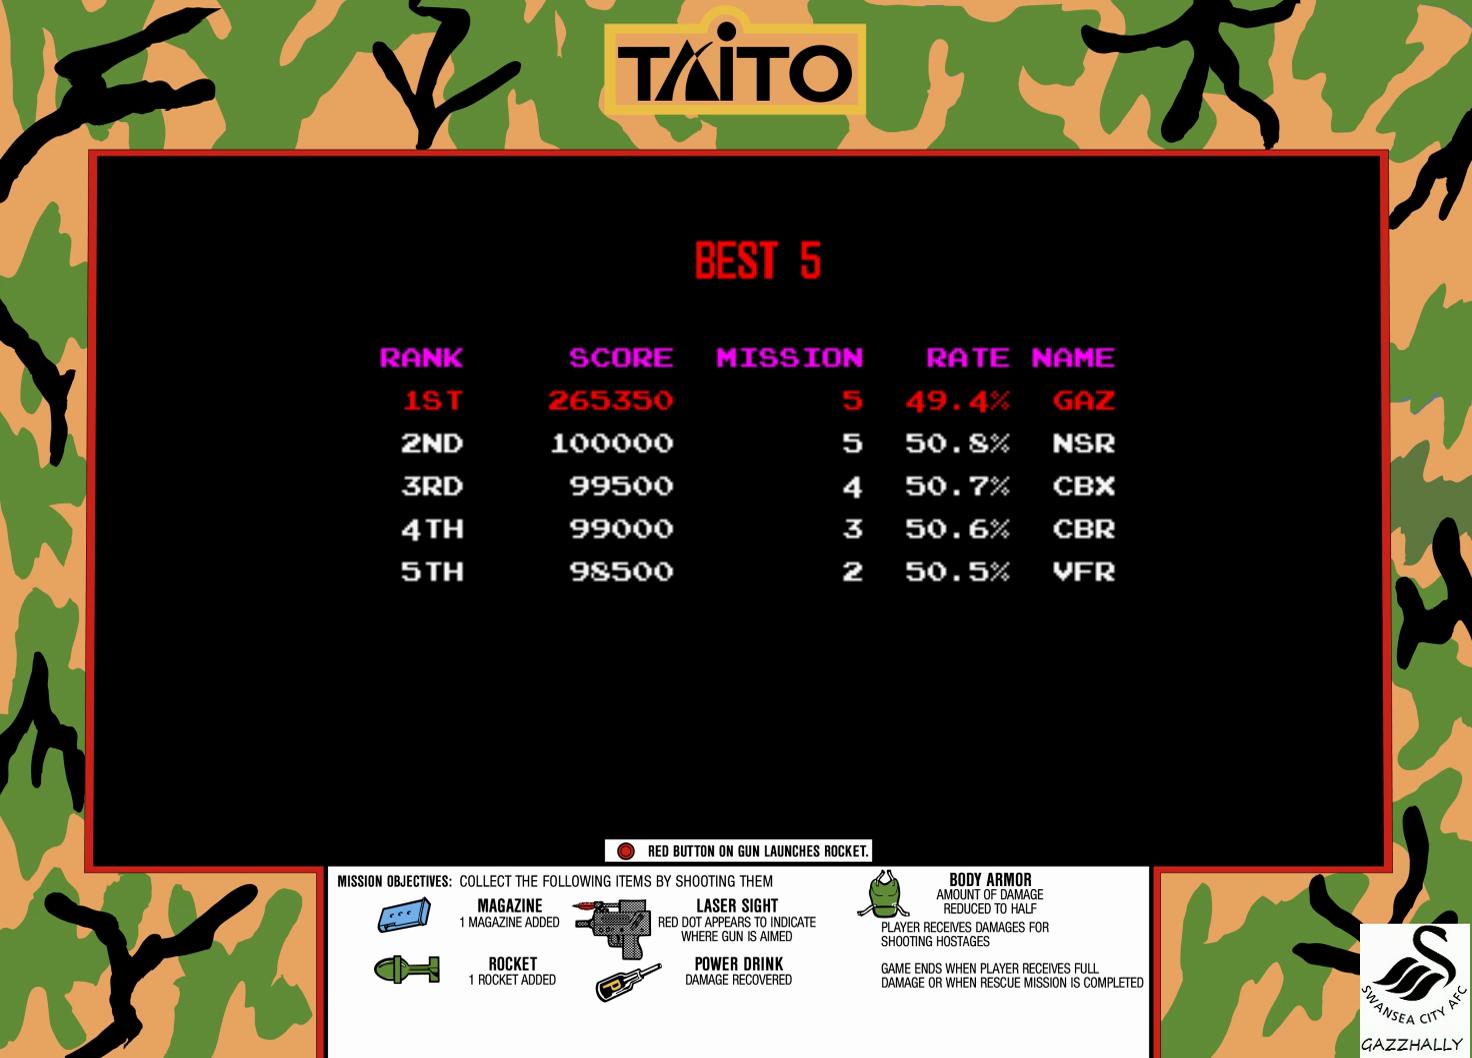 Operation Thunderbolt 265,350 points